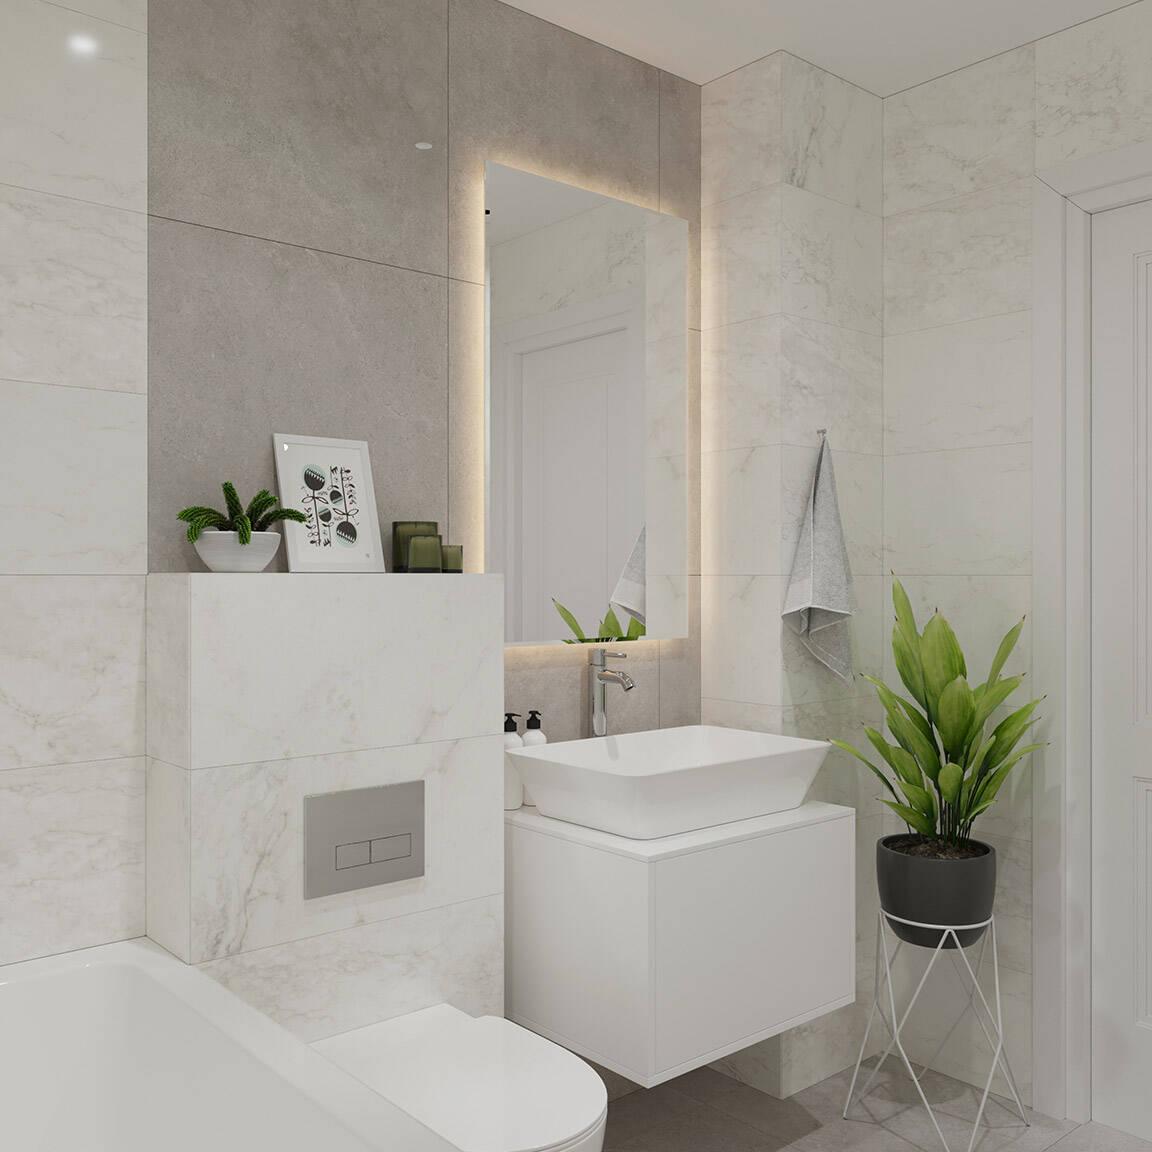 Catedral Residence - Bathroom - Marazzi Ceramic tiles - 10